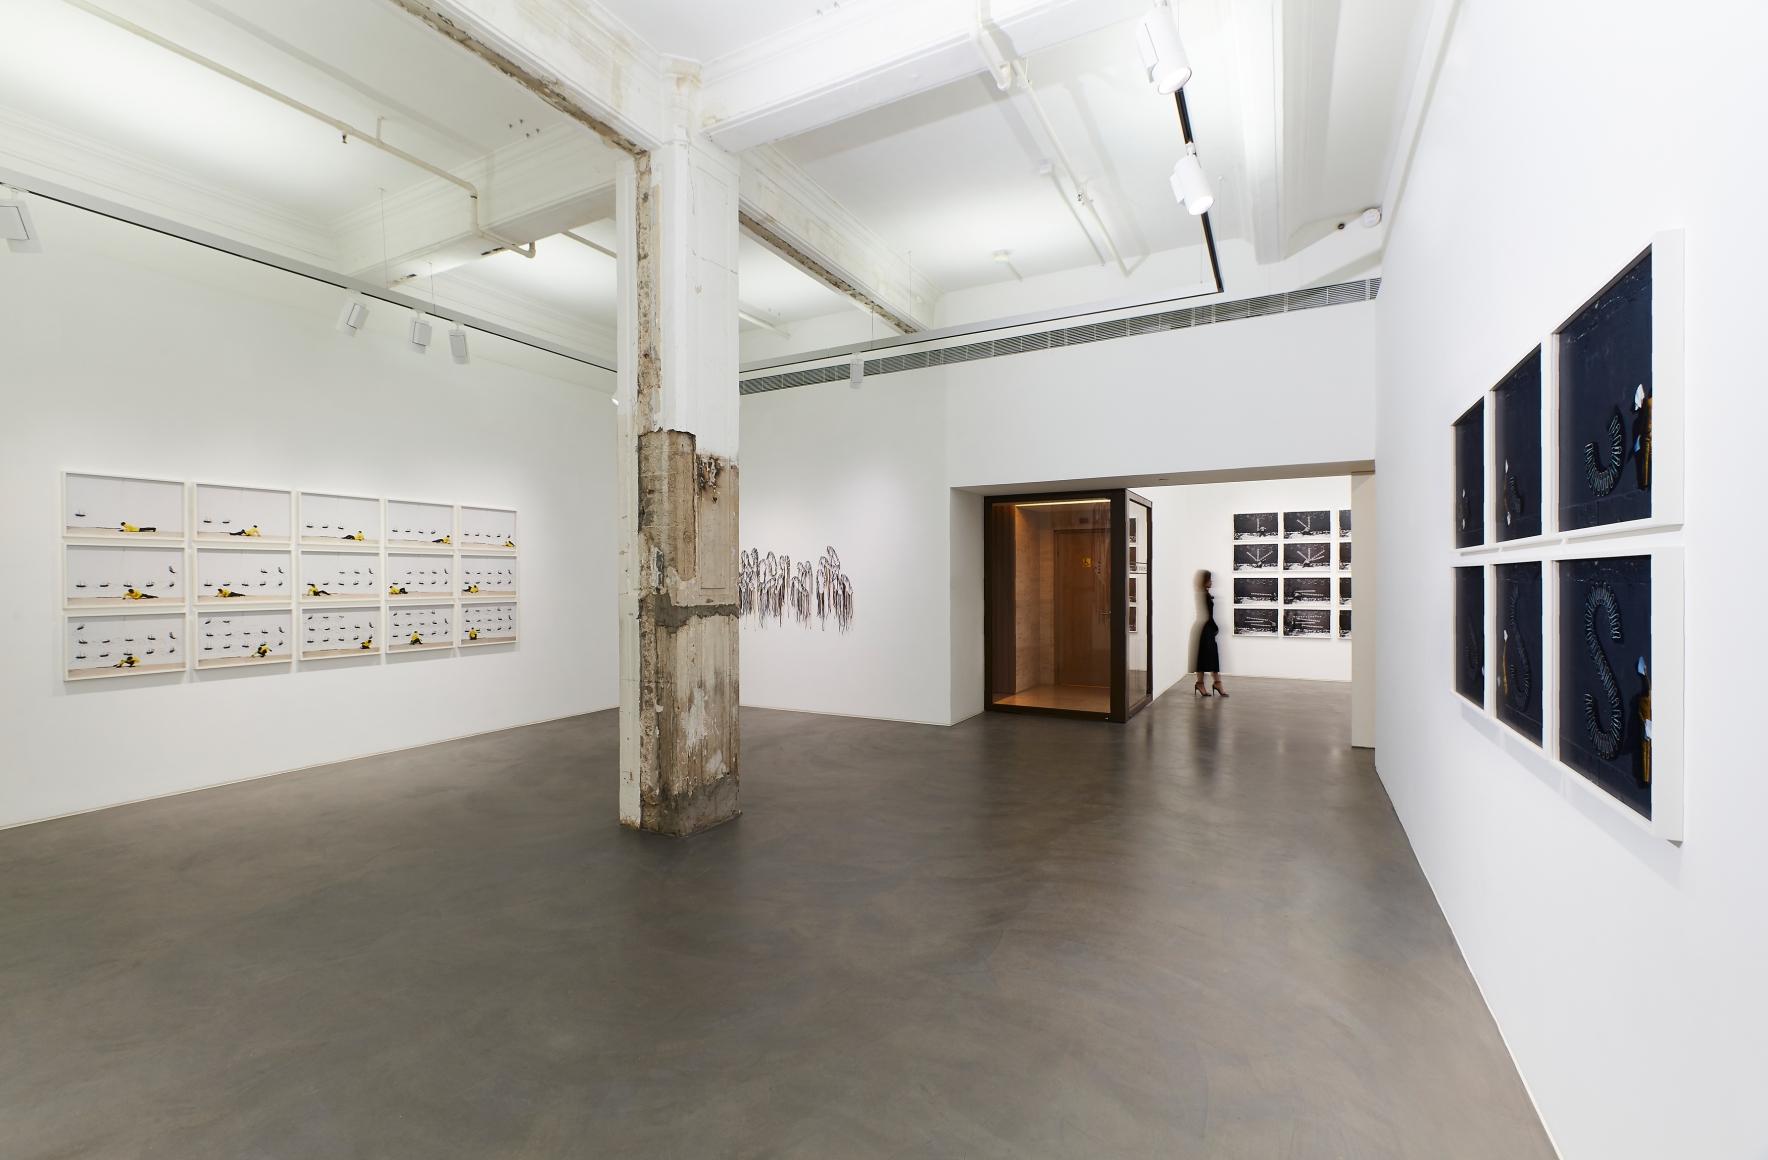 Exhibition view 3 of Robin Rhode & Nari Ward: Power Wall